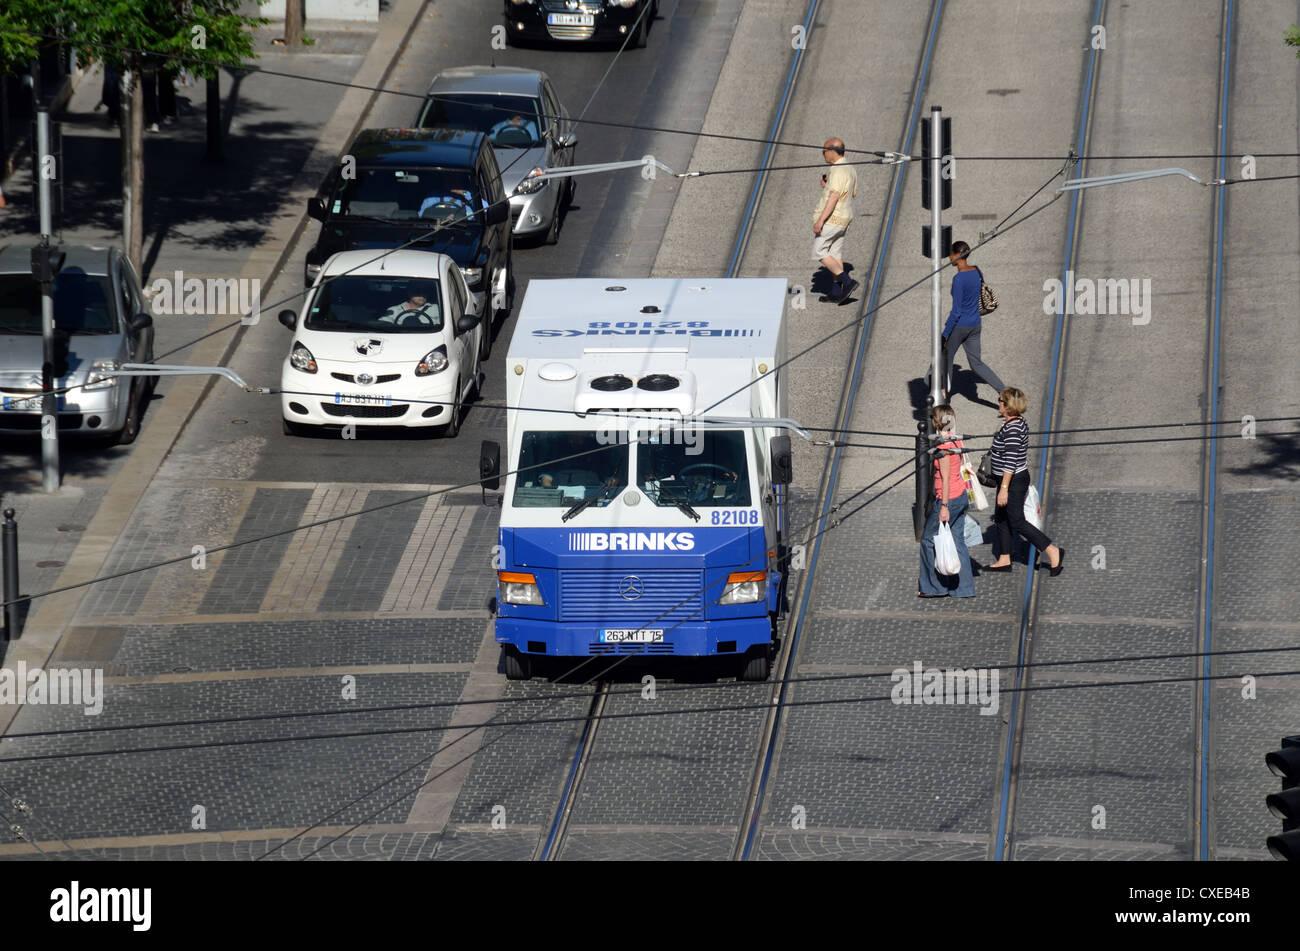 Brinks Security Van o veicolo Marsiglia o Marsiglia Francia Immagini Stock